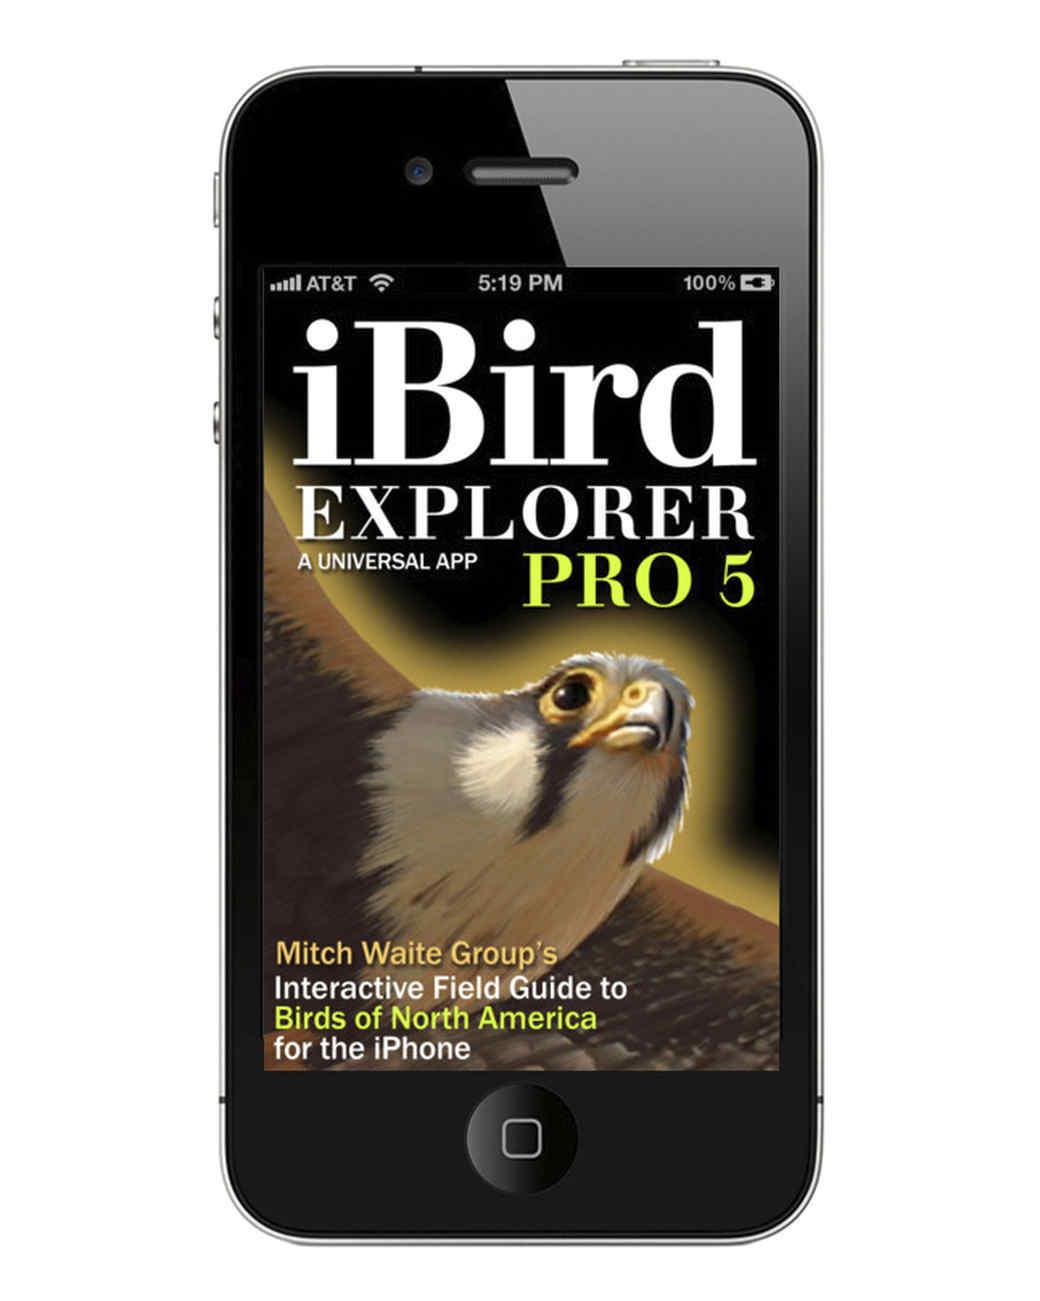 ibird-explorer-pro.jpg